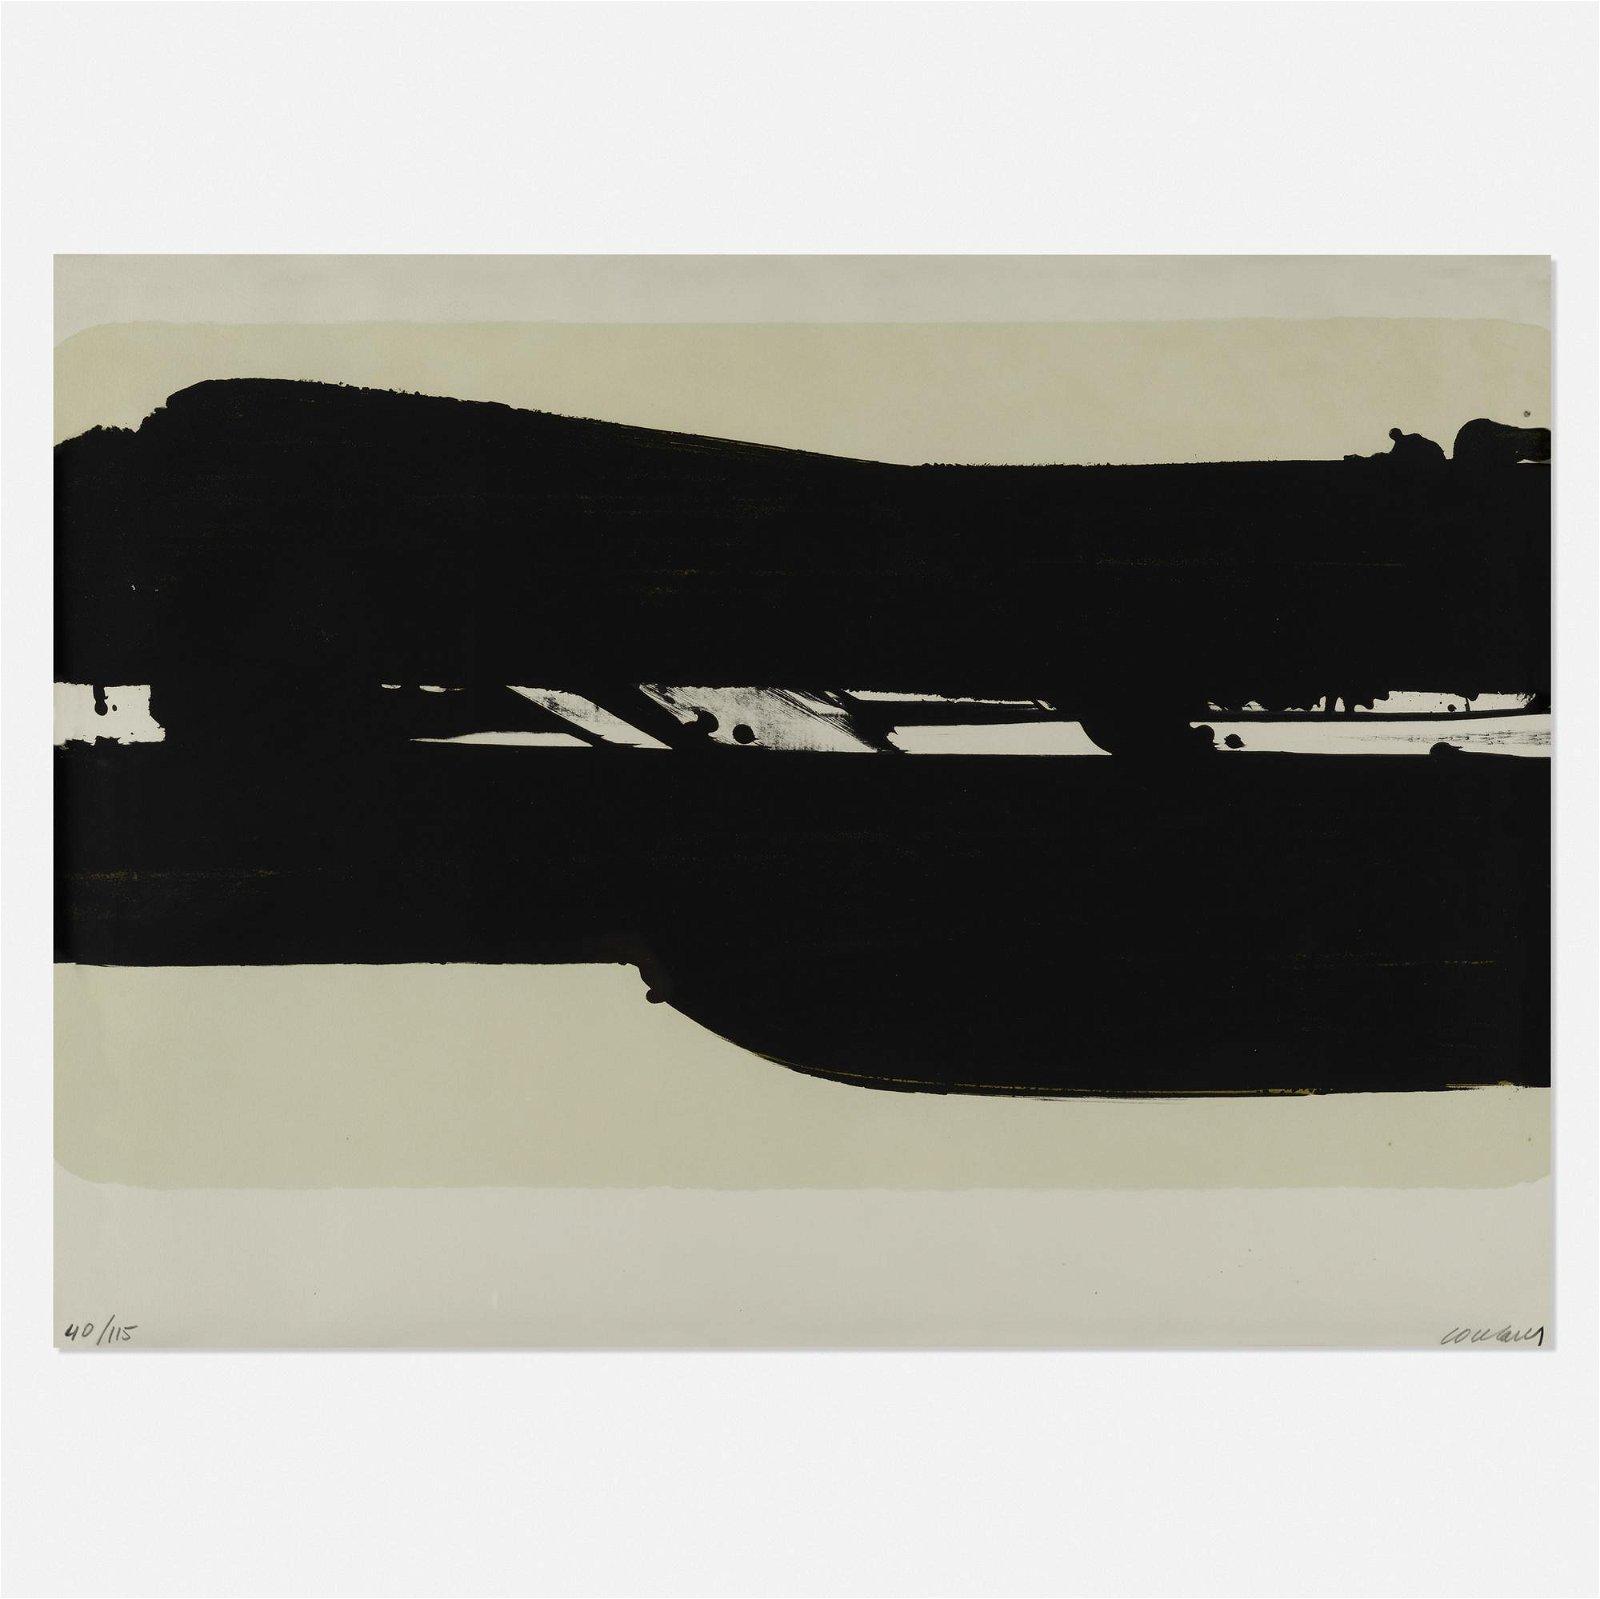 Pierre Soulages, Lithographie no. 39